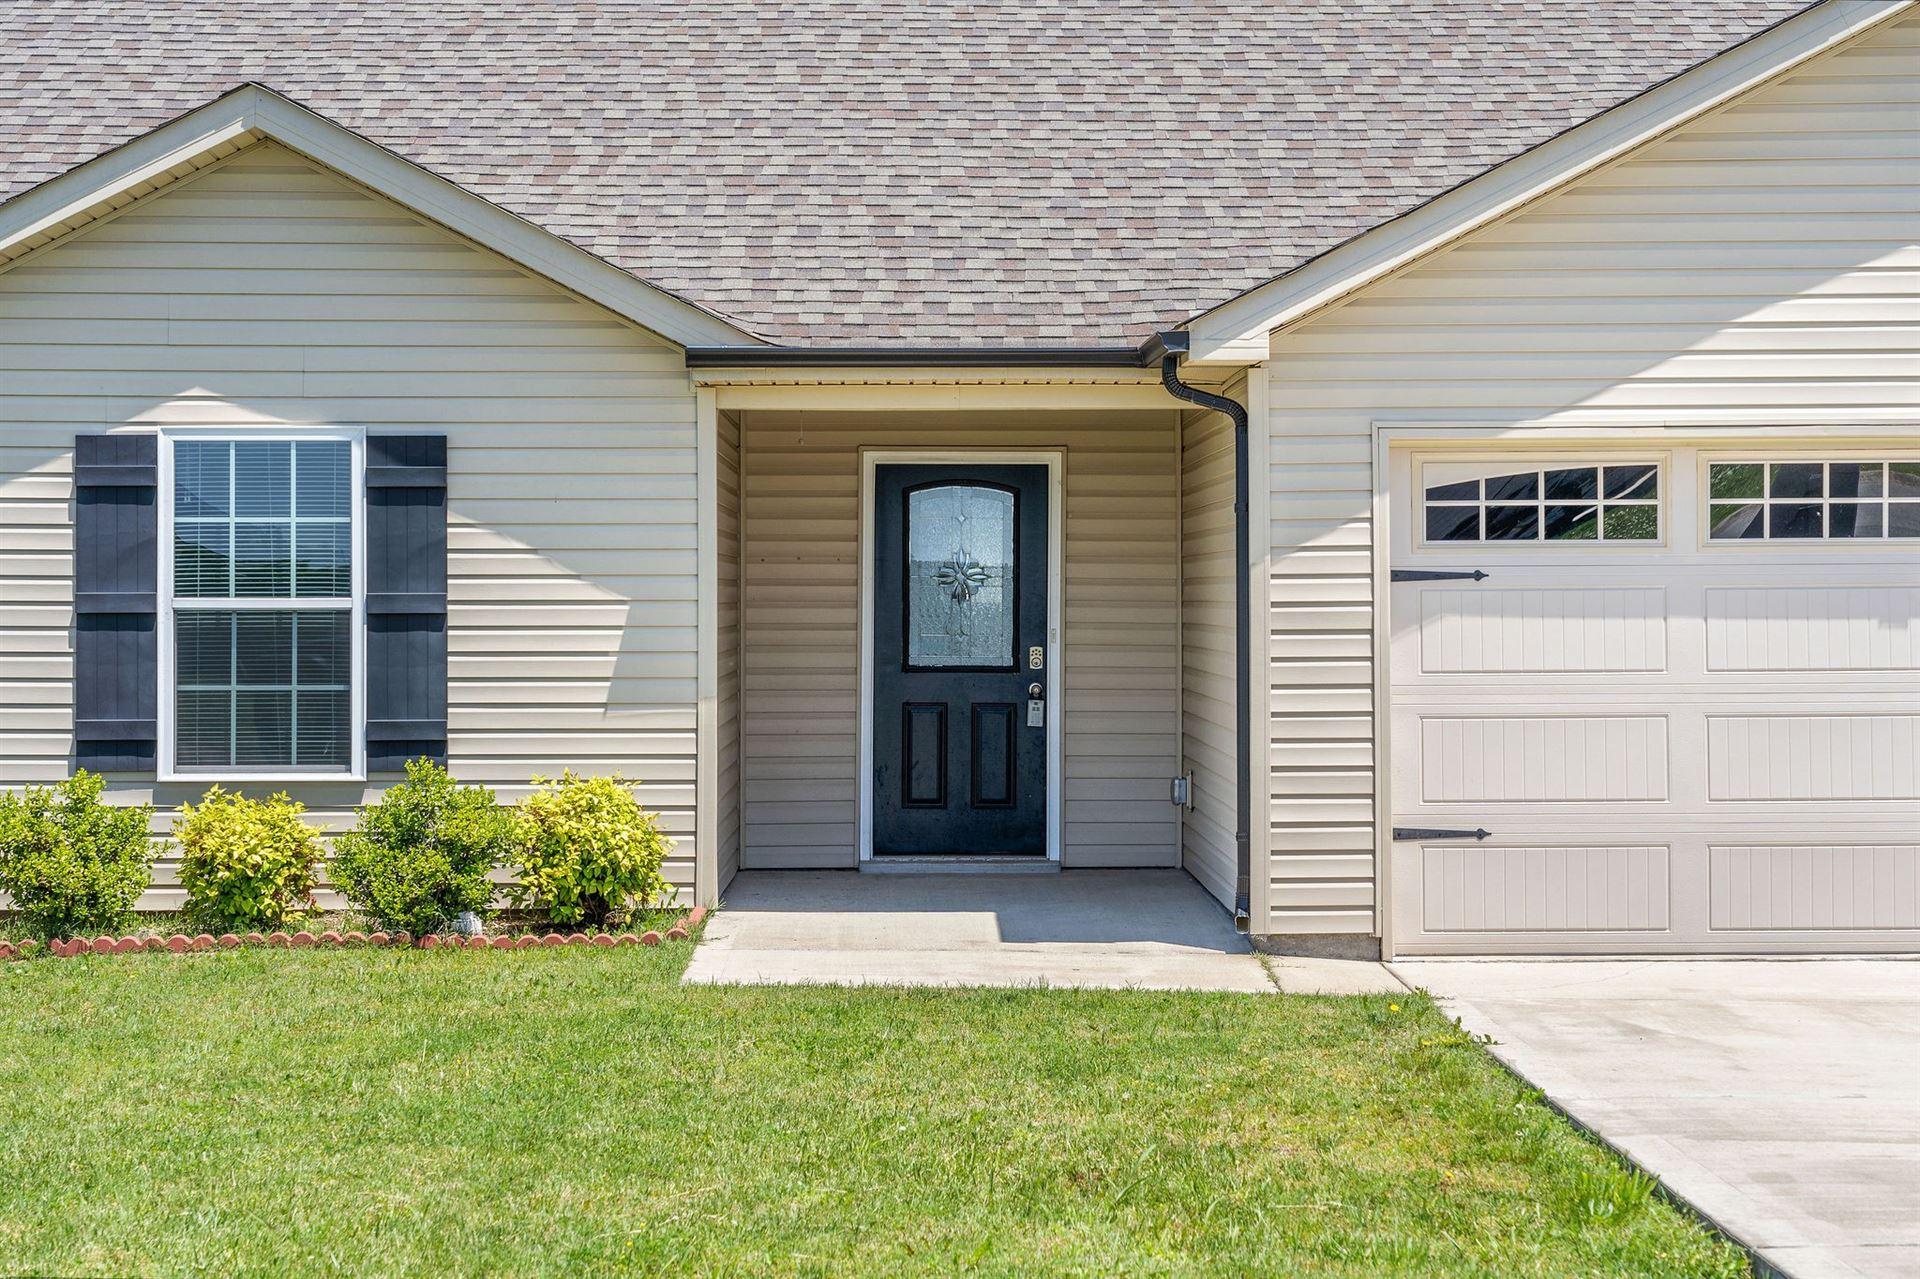 120 Bob White Trl, Oak Grove, KY 42262 - MLS#: 2251497